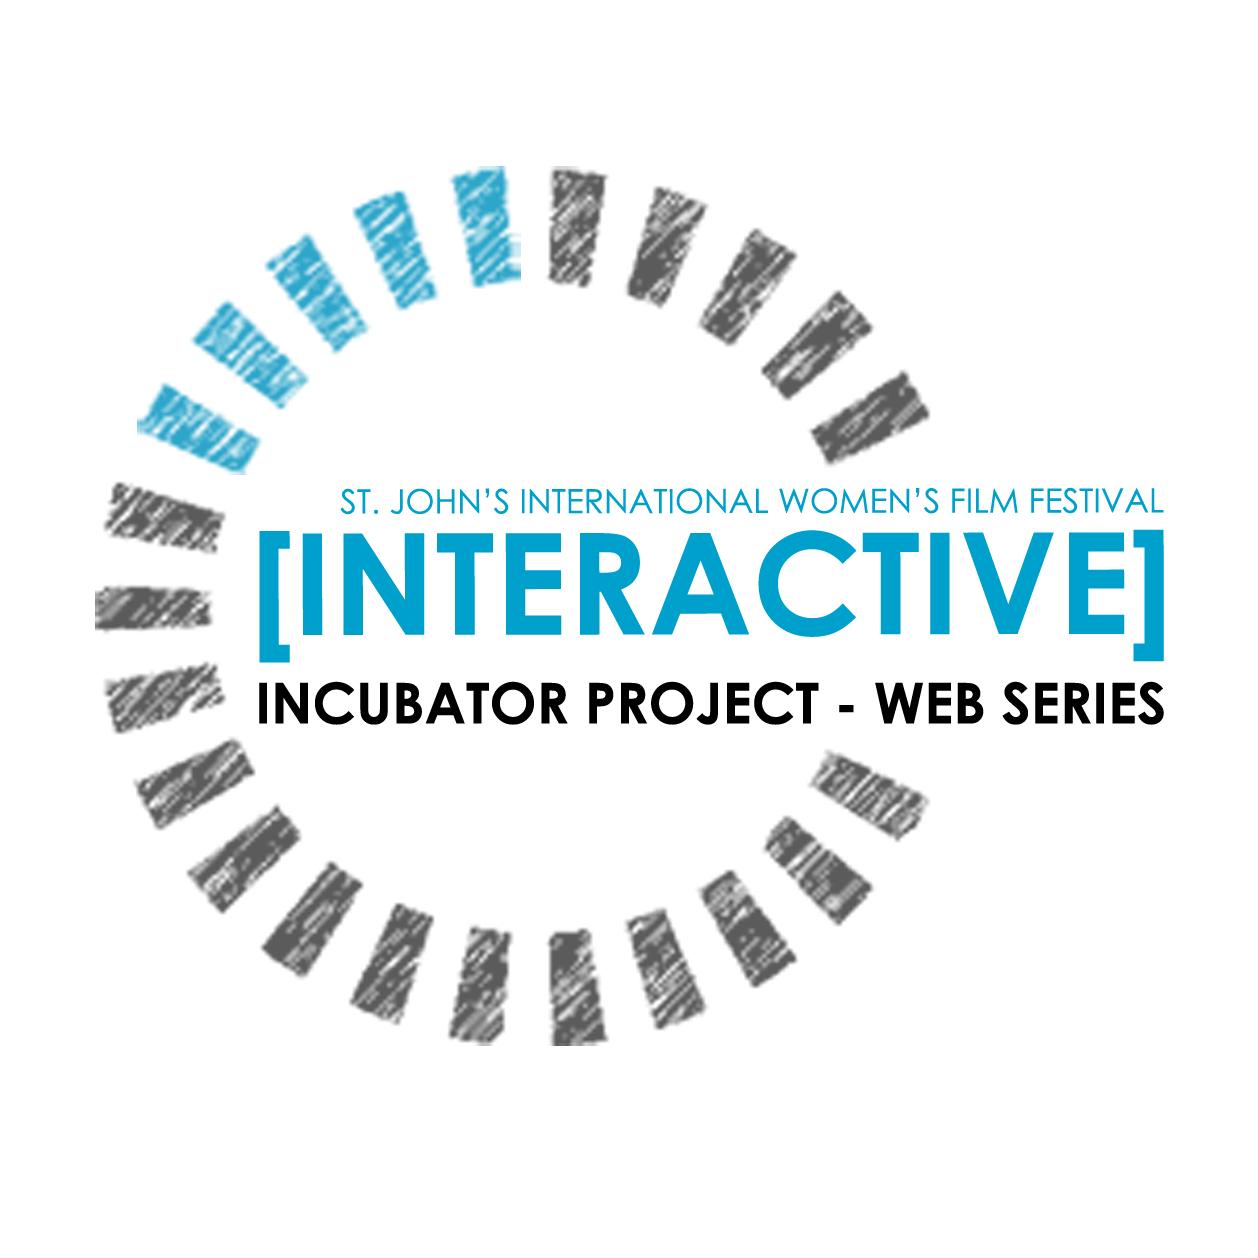 INCUBATOR PROJECT 2018 WEB SERIES.png